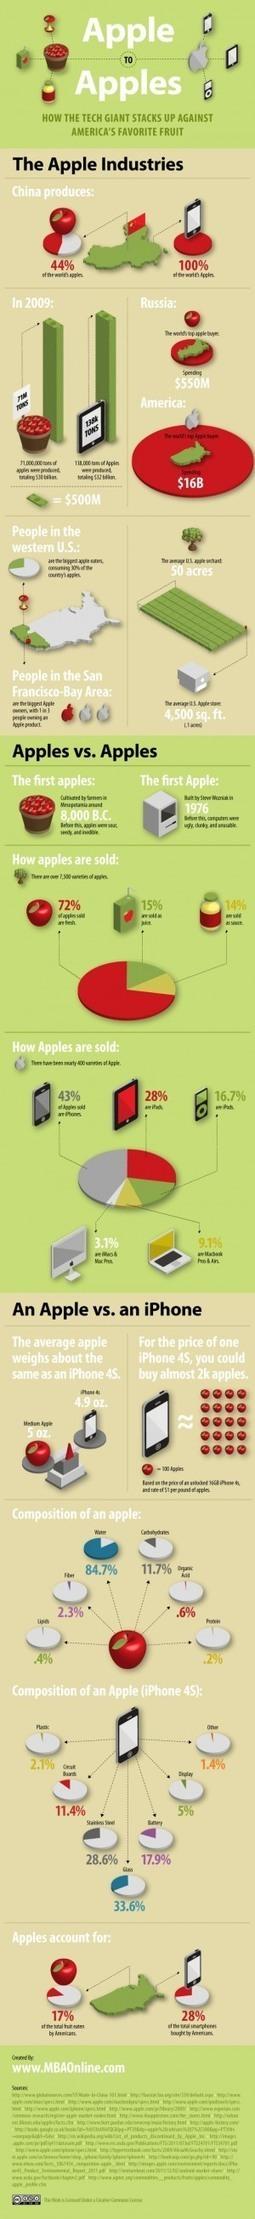 Apple vs. manzanas #infografia #infographic#apple | Fer Tiburcio | Scoop.it